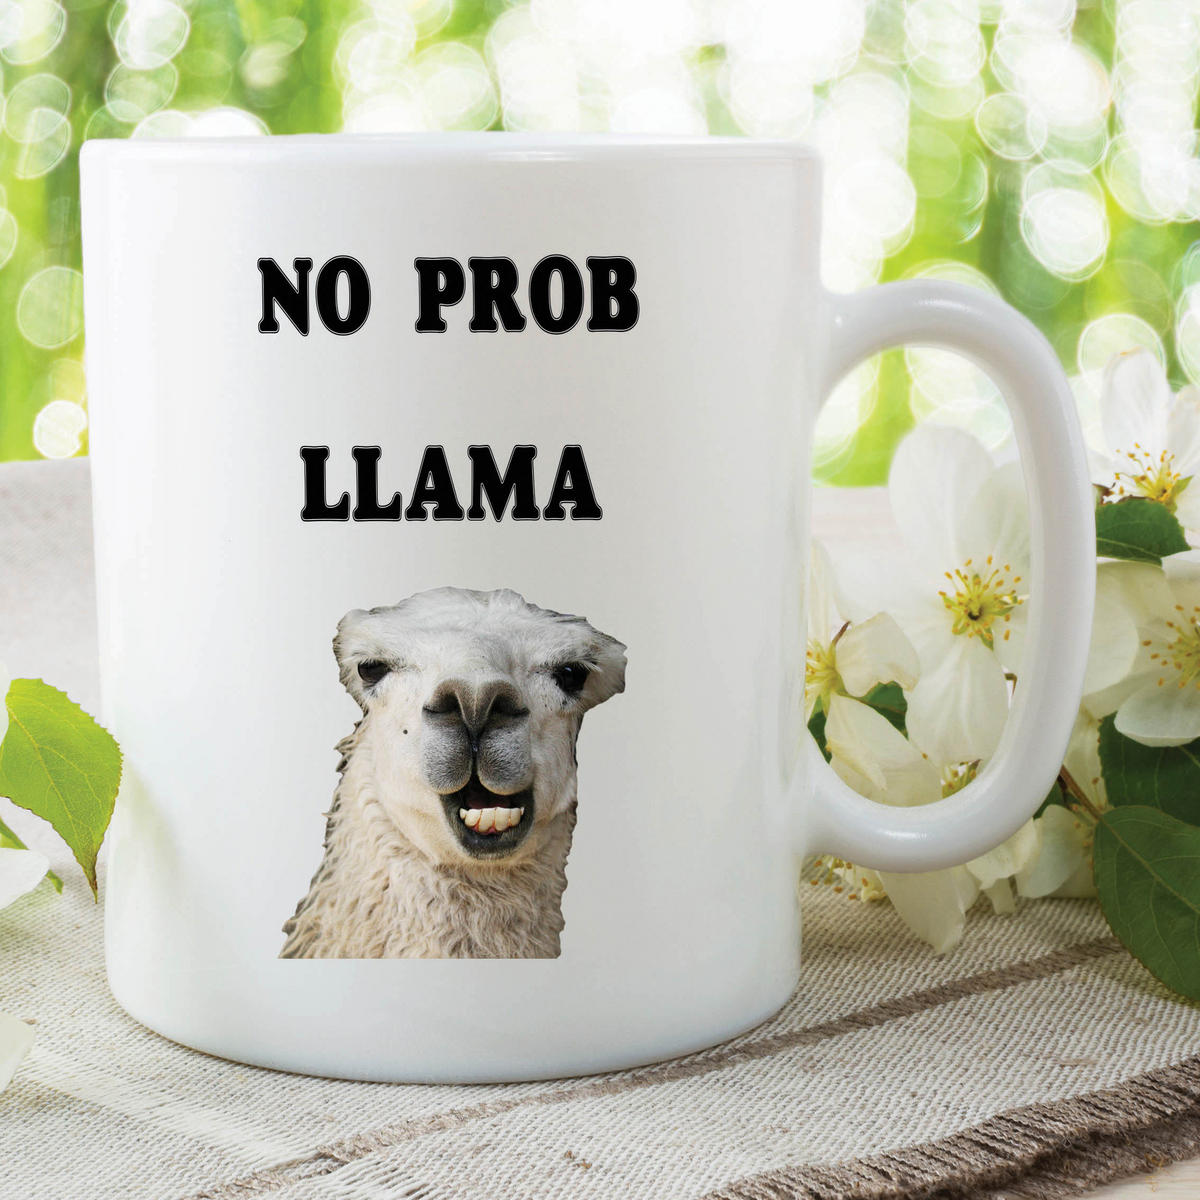 Funny Novelty Mugs Joke Adult Humour No Prob Llama Work Office Coffee WSDMUG614